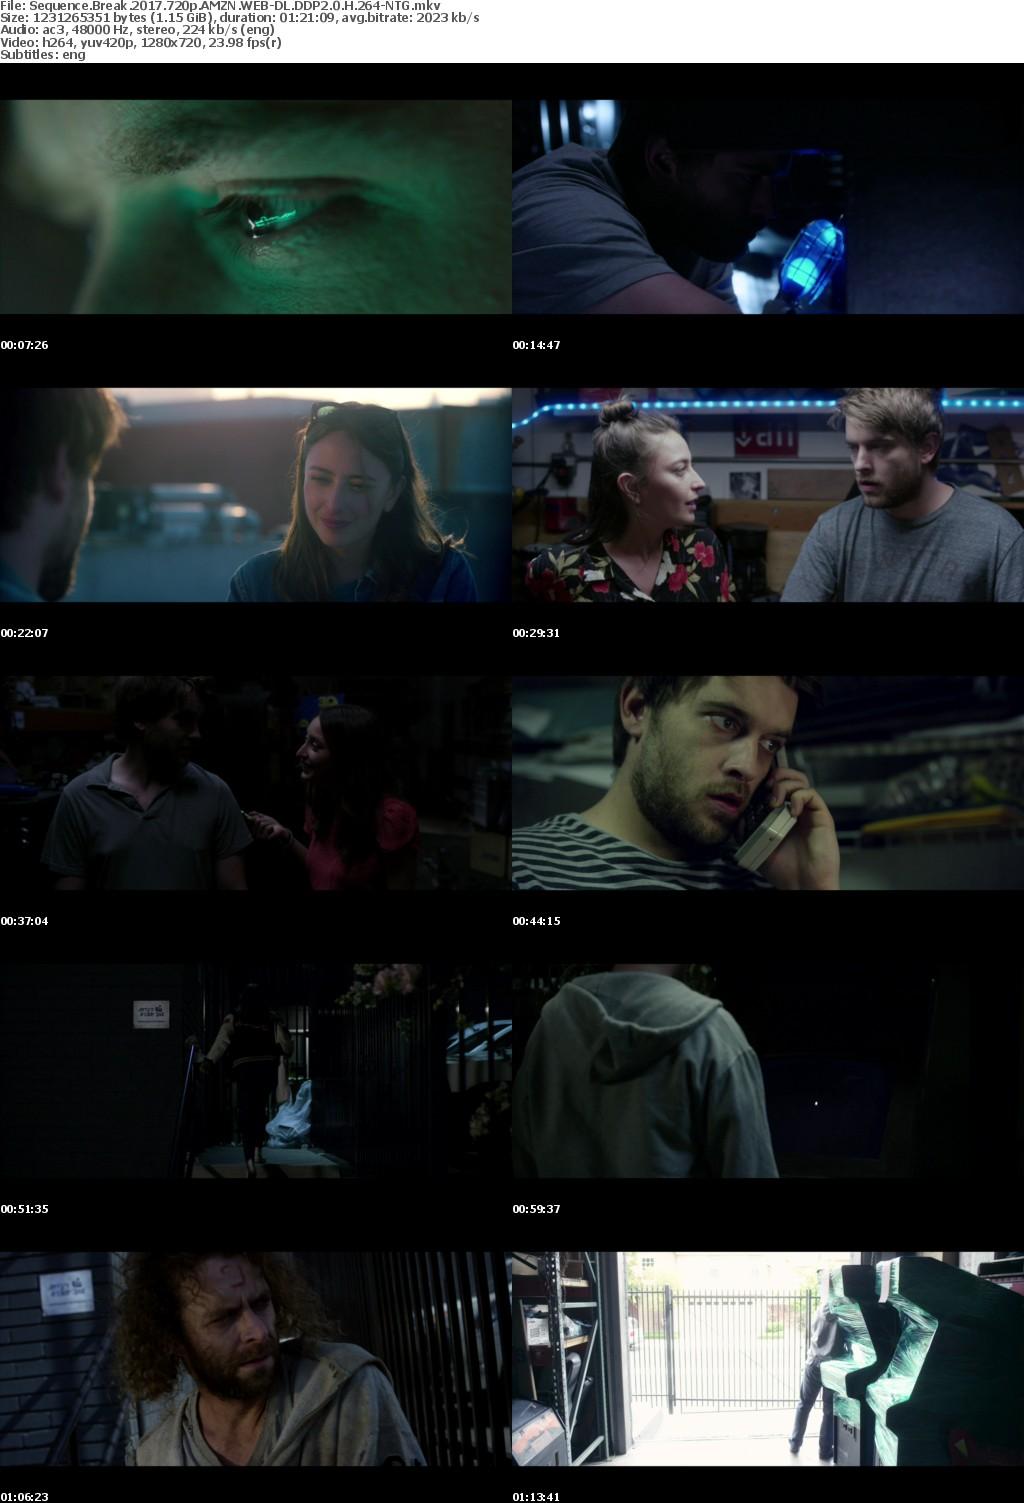 Sequence Break (2017) 720p AMZN WEB-DL DDP2.0 H264-NTG